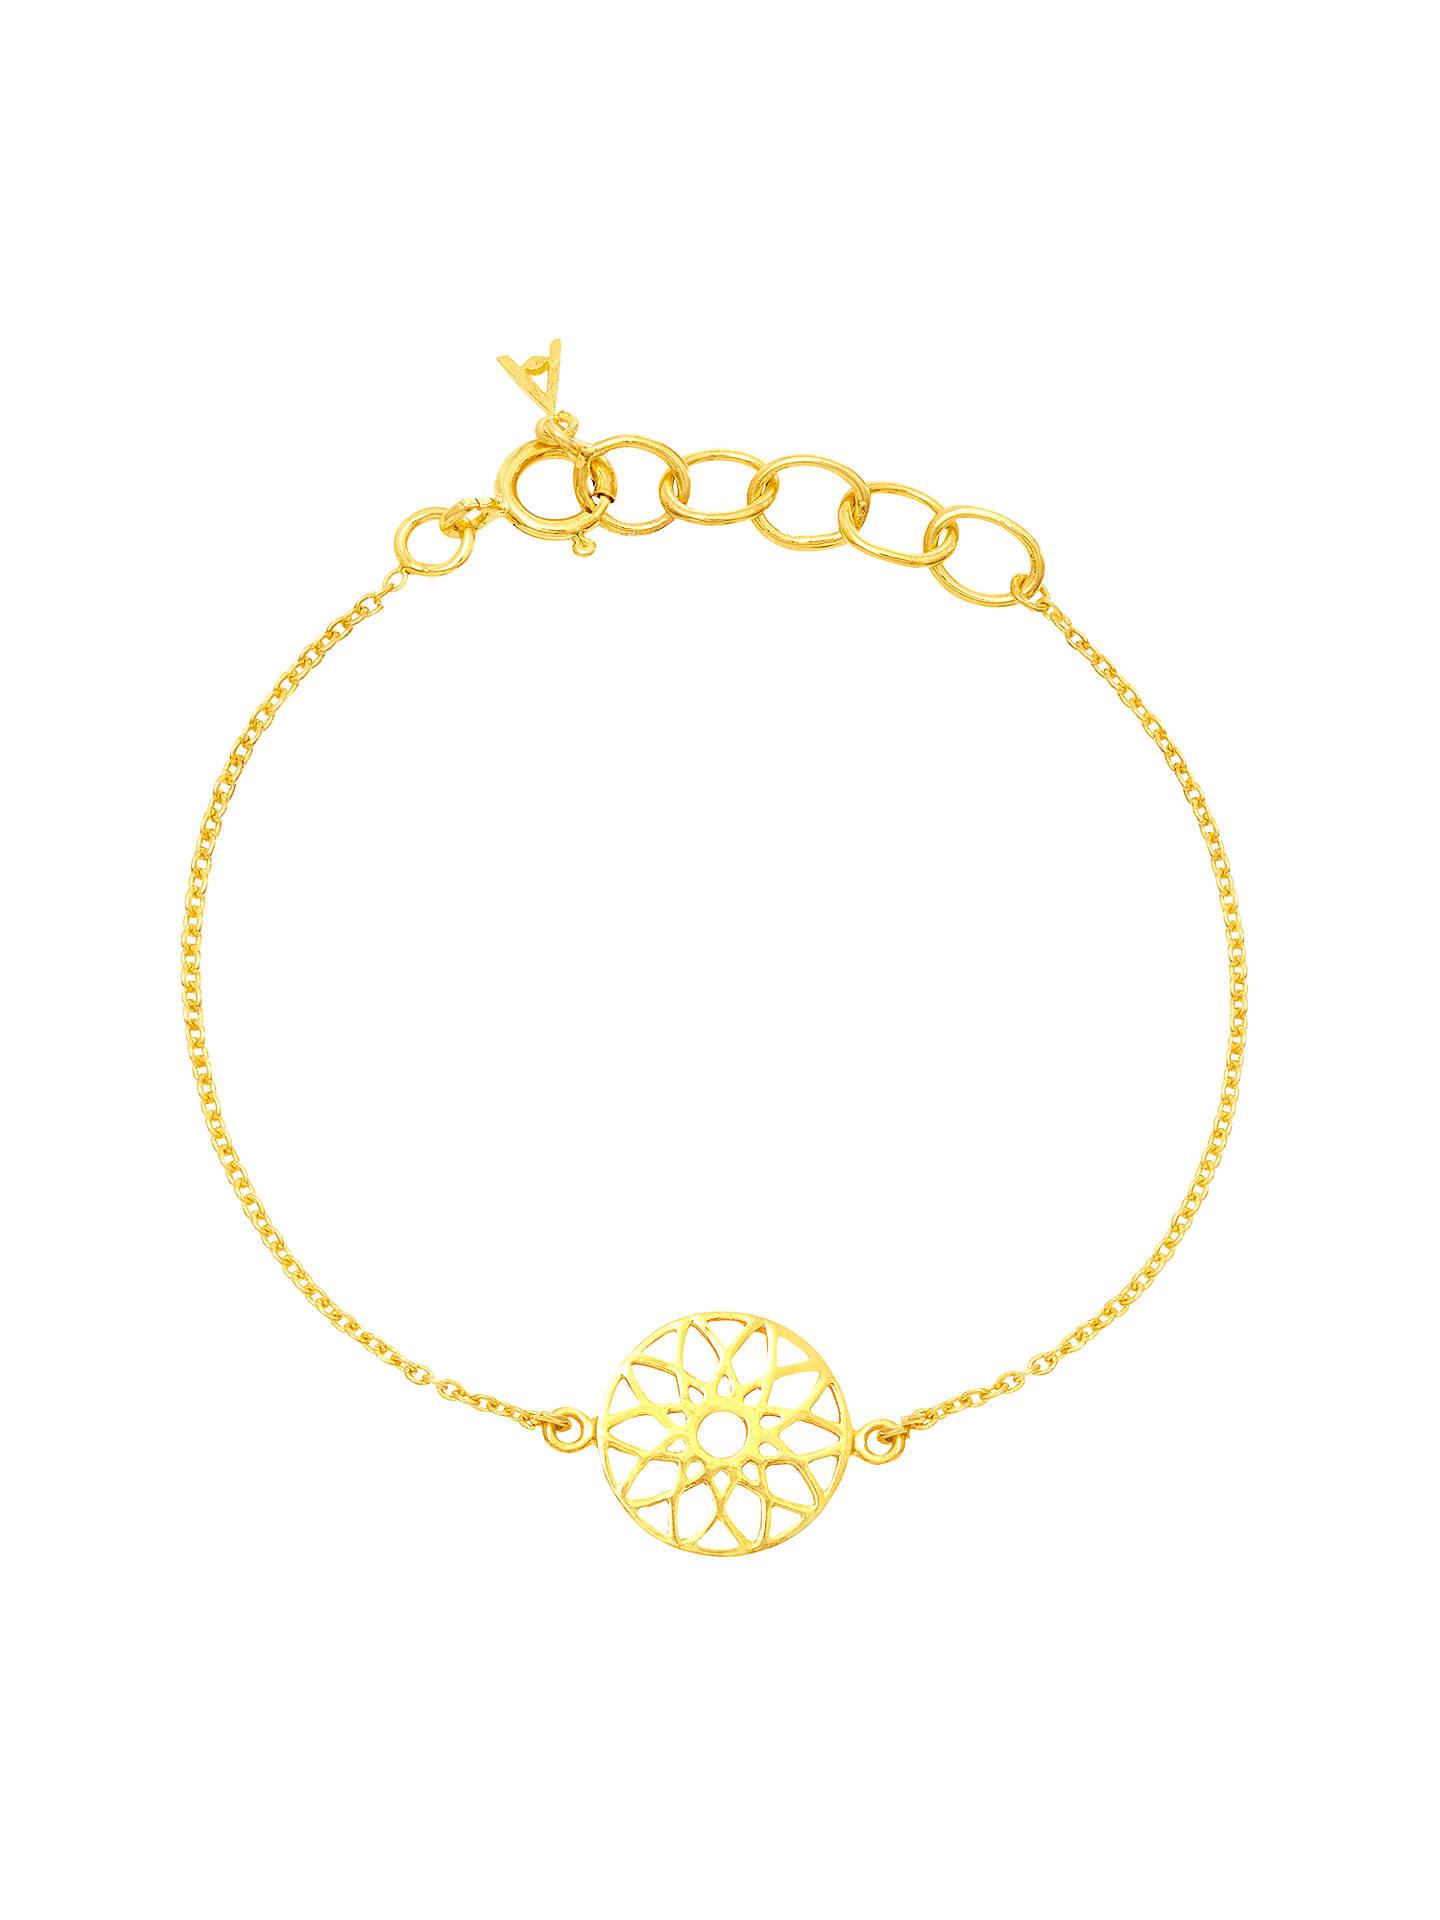 Women Lady Girls mini small gold//silver Dream Catcher Wrist Bracelet Gift her